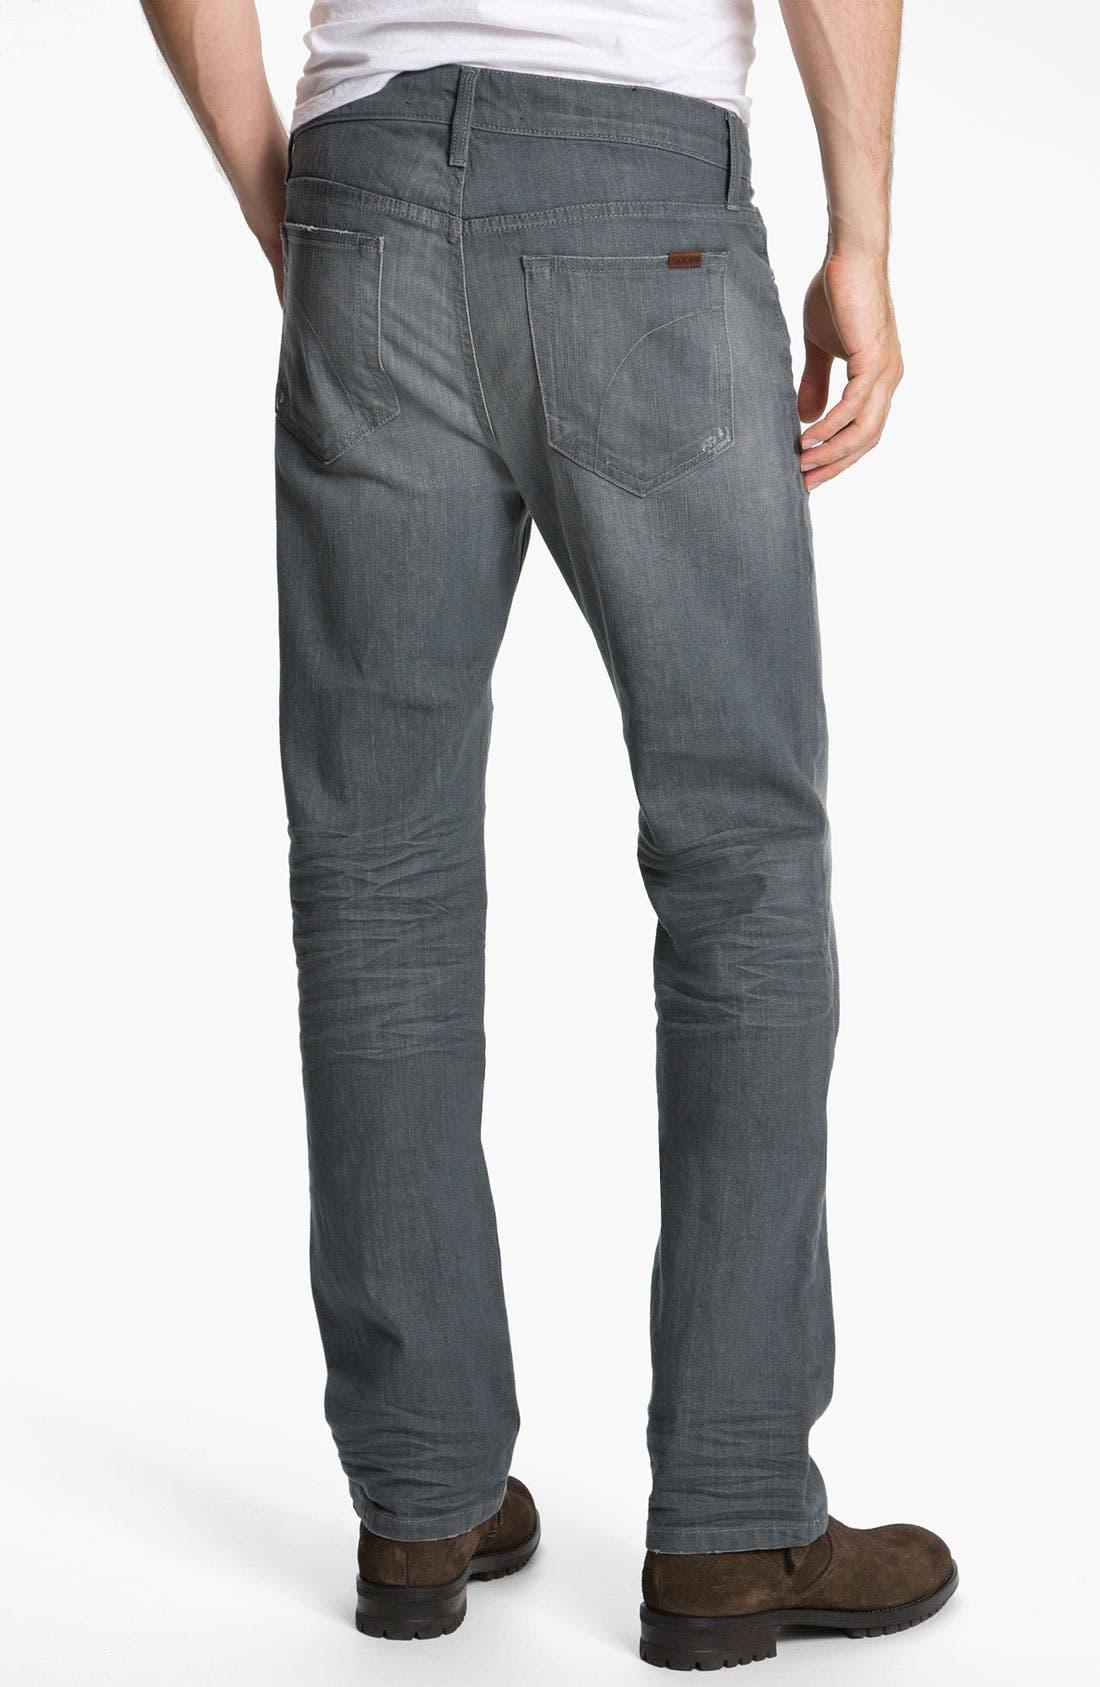 Alternate Image 1 Selected - Joe's 'Classic' Straight Leg Jeans (Marquis)